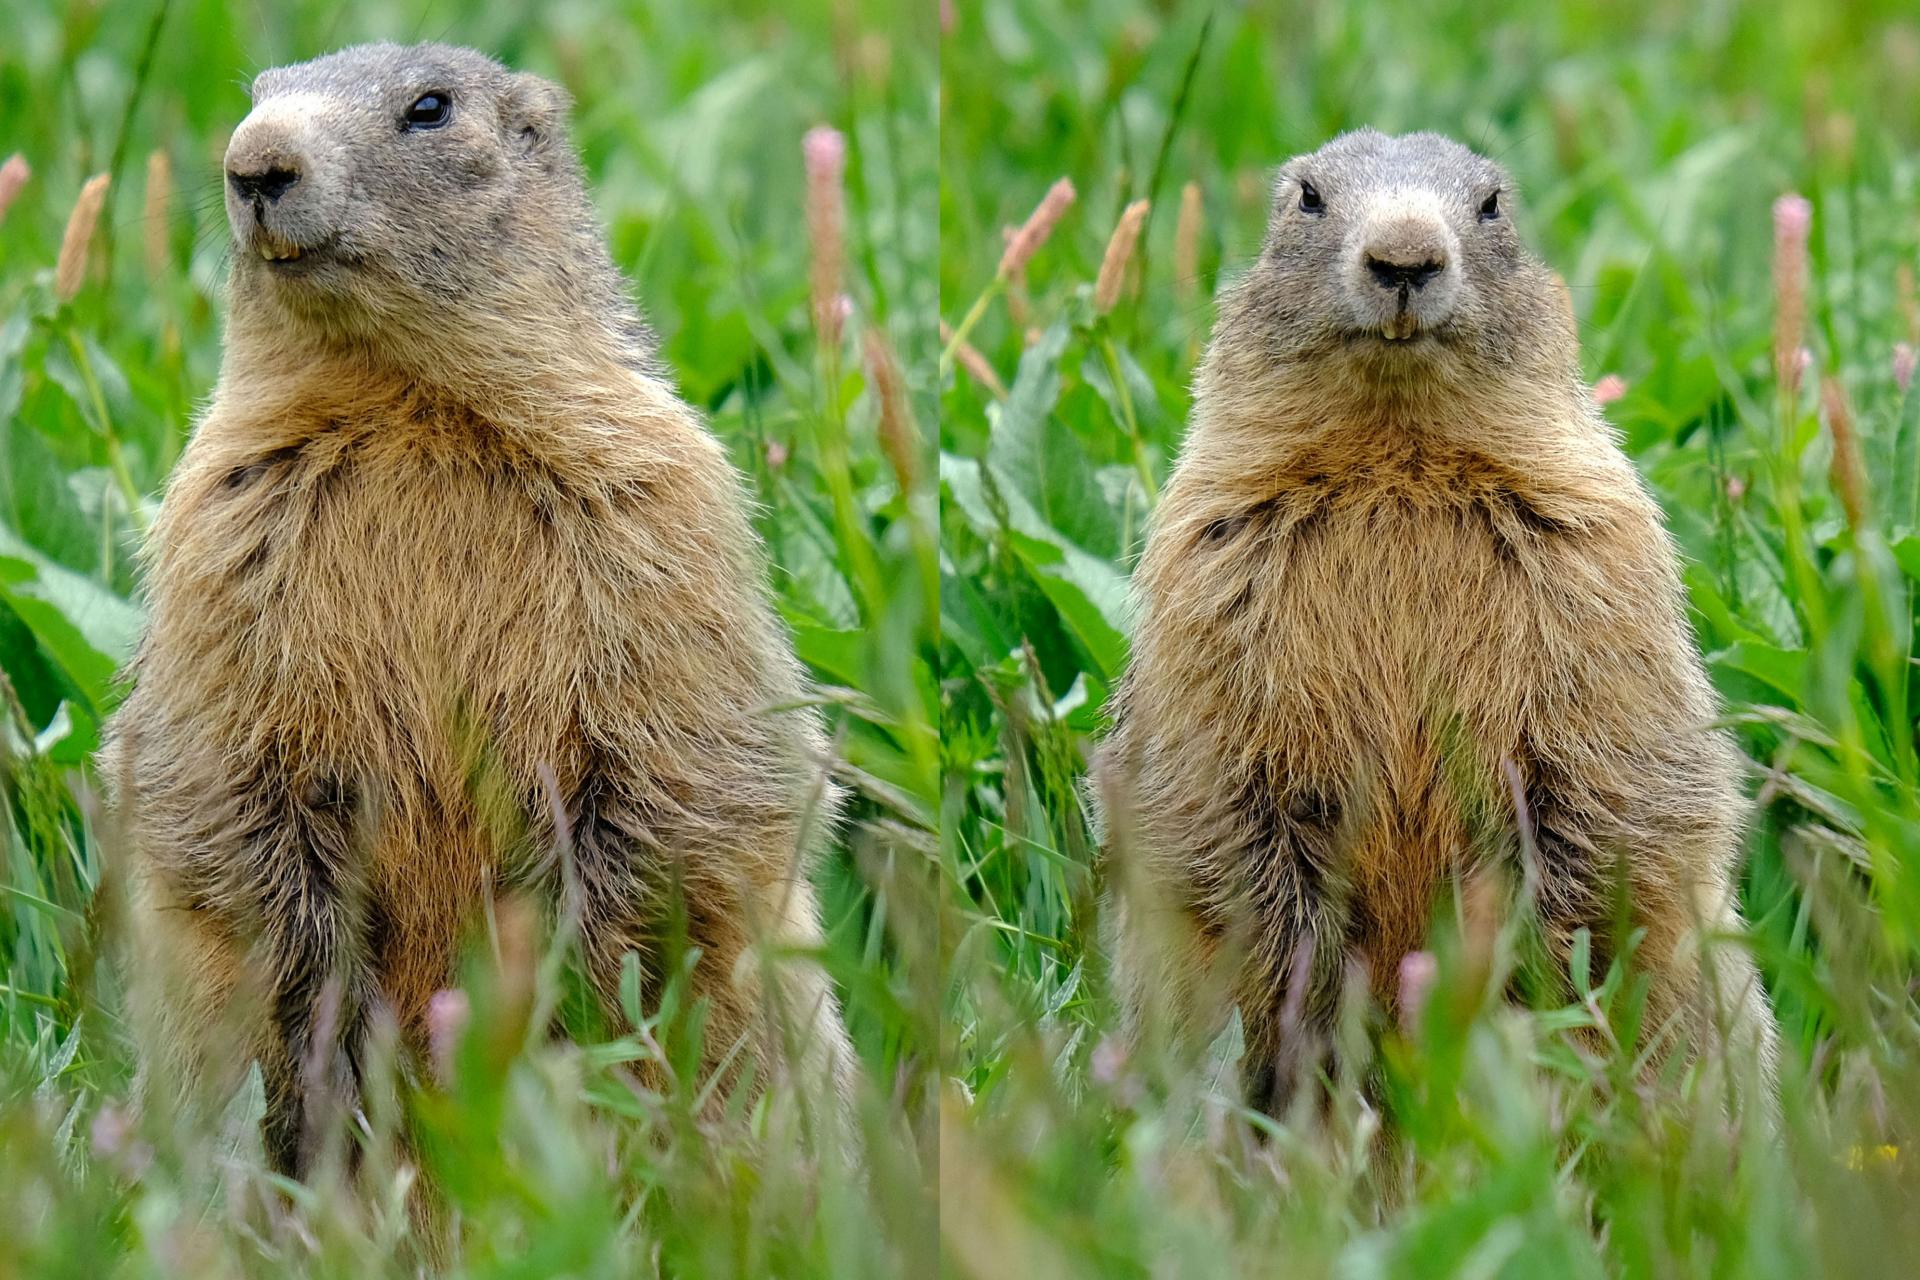 Maman marmotte pm